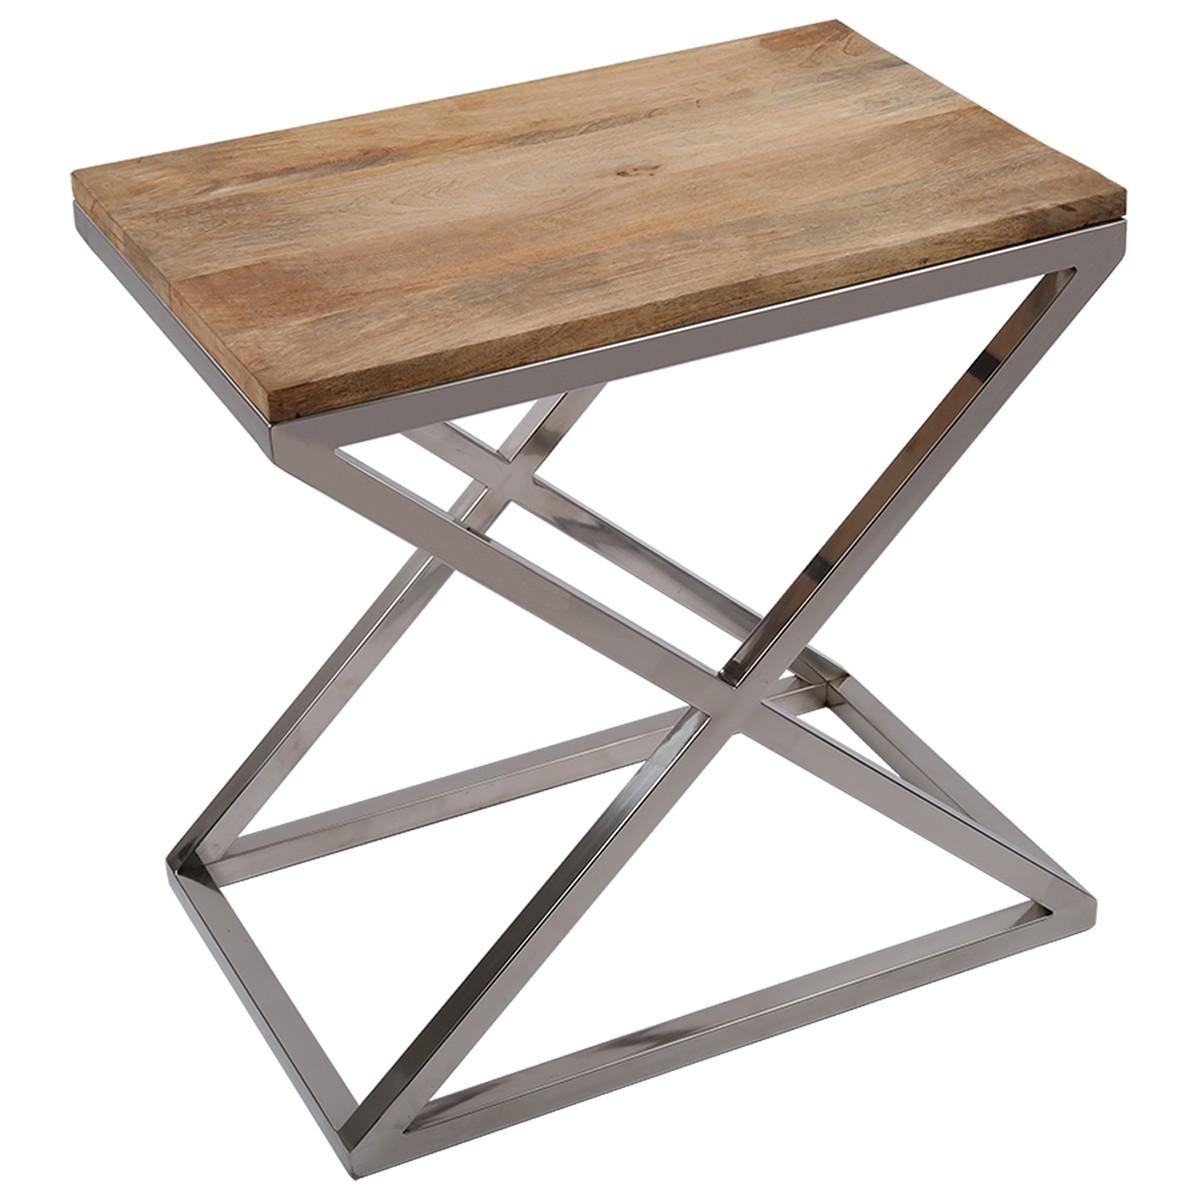 beistelltisch rechteckig holz metall tisch verchromt. Black Bedroom Furniture Sets. Home Design Ideas